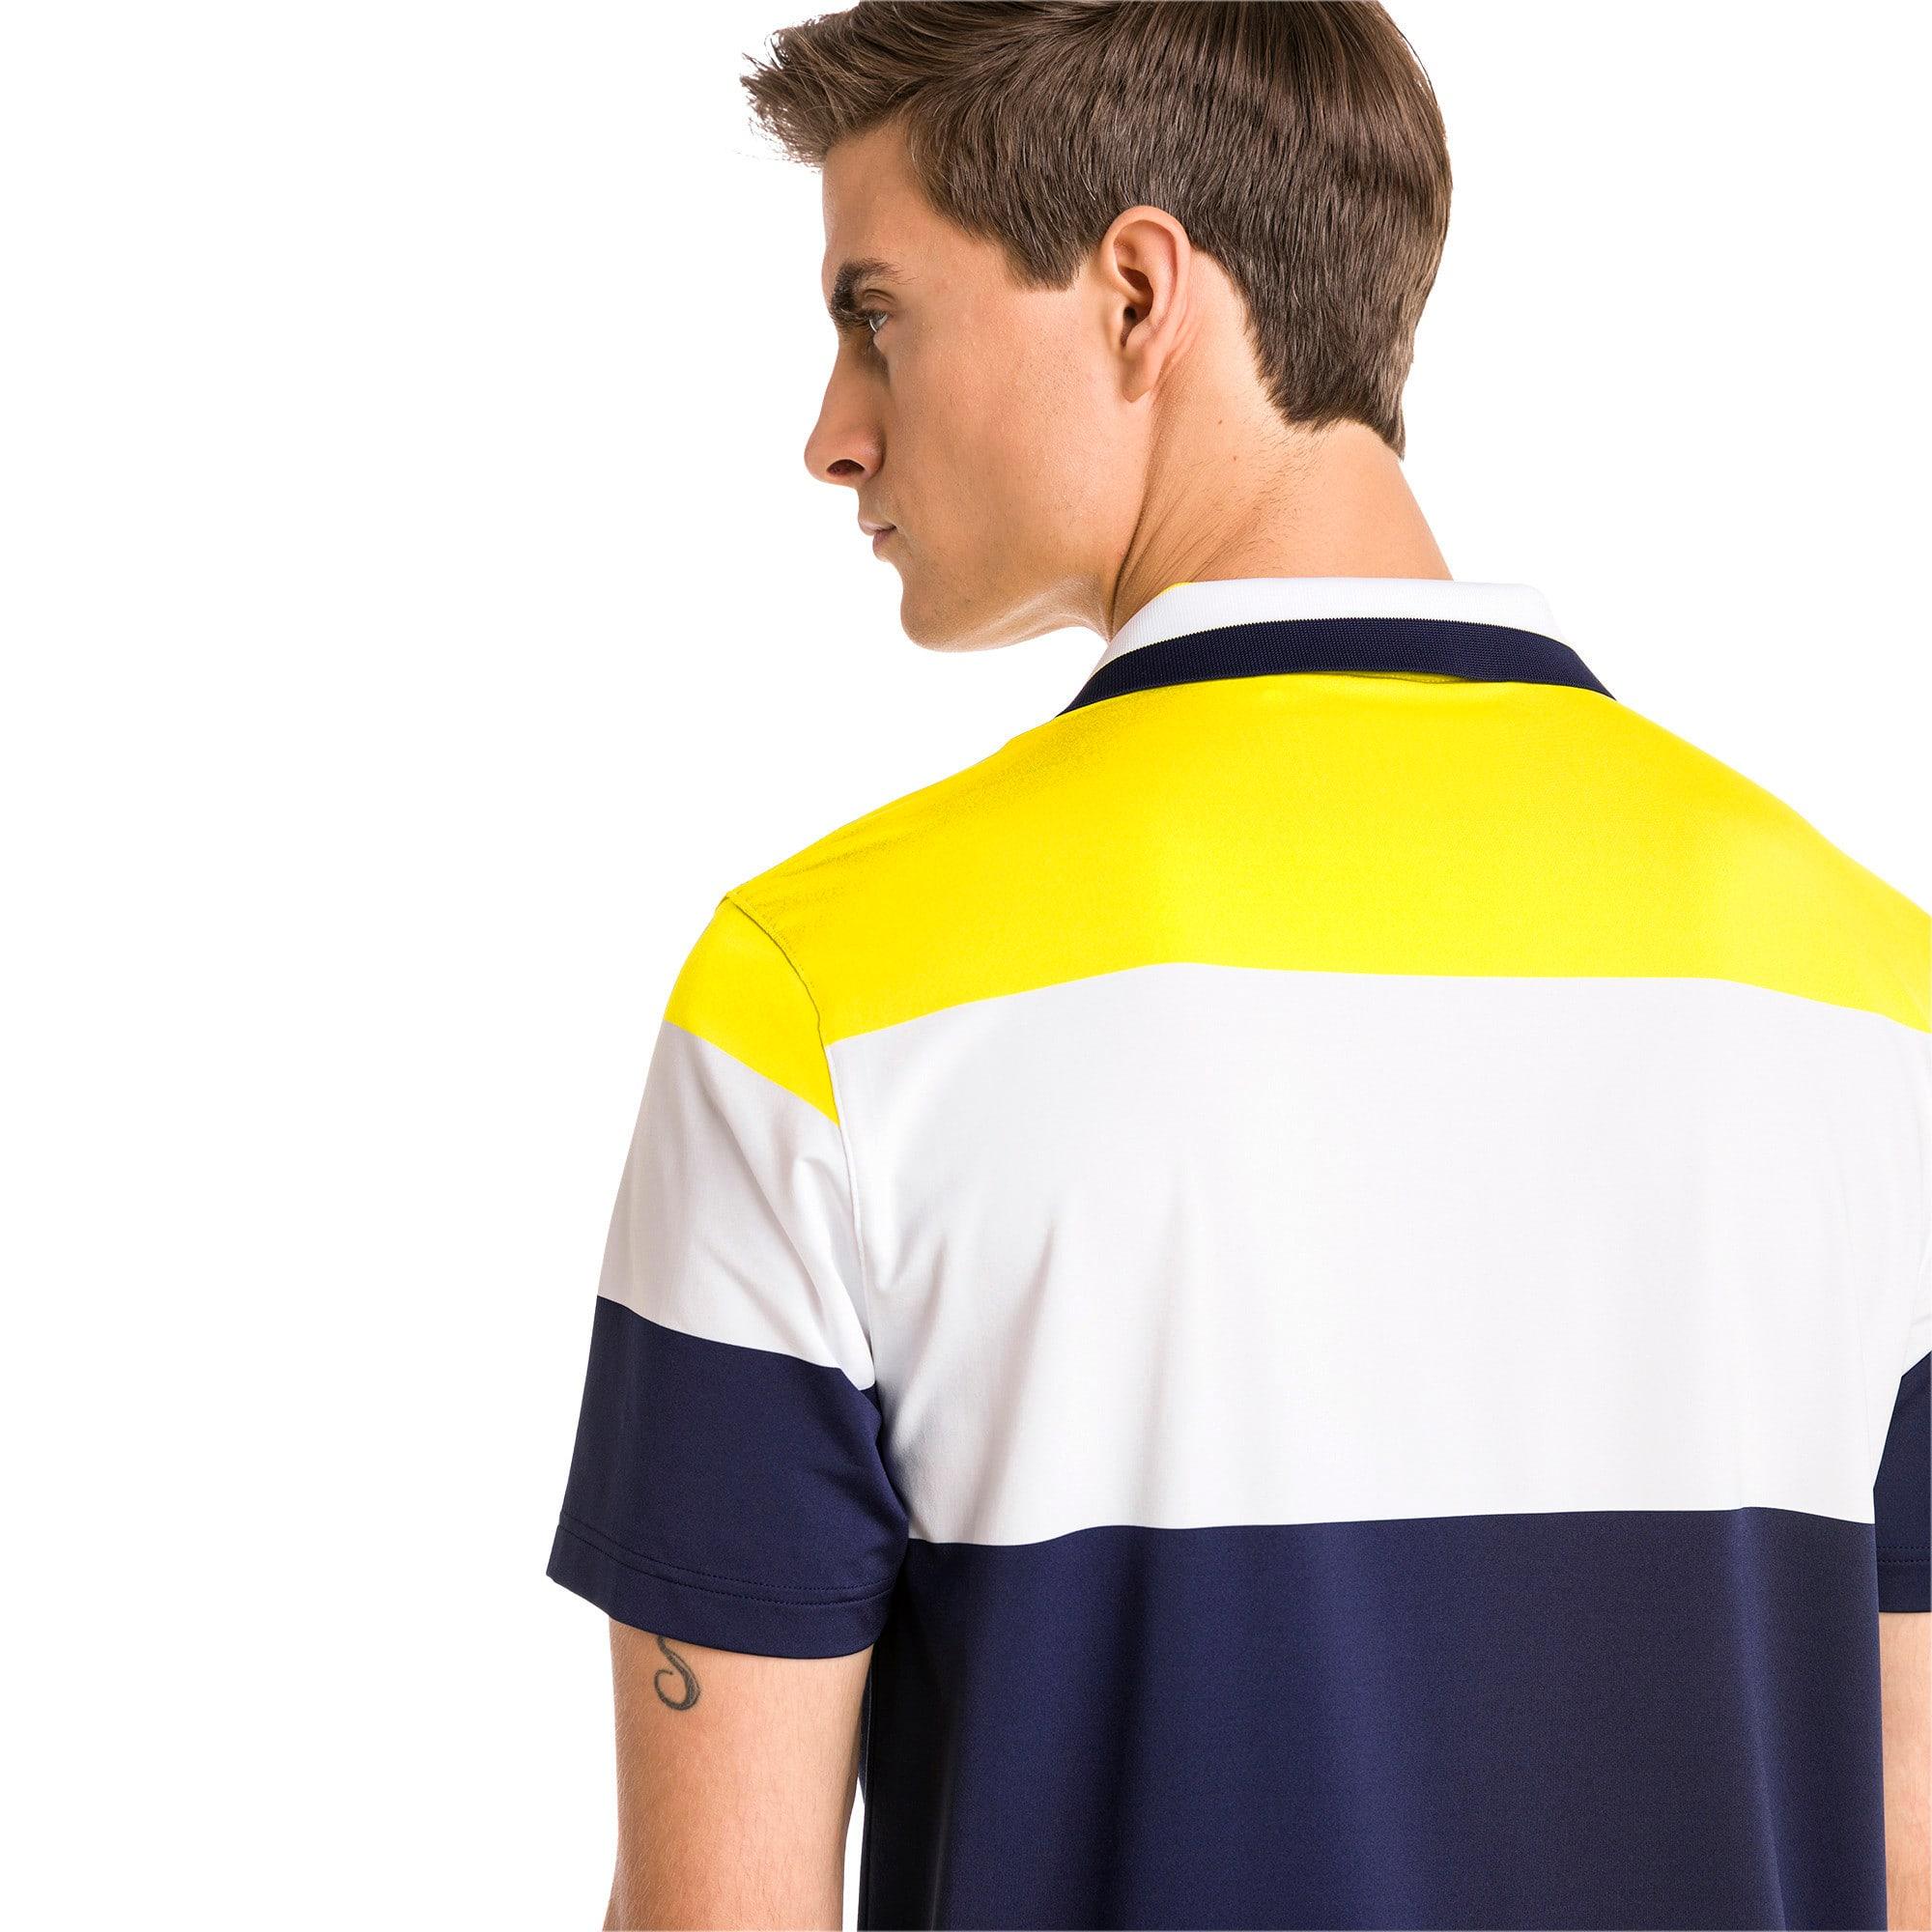 Thumbnail 2 of Nineties Men's Golf Polo, Blazing Yellow, medium